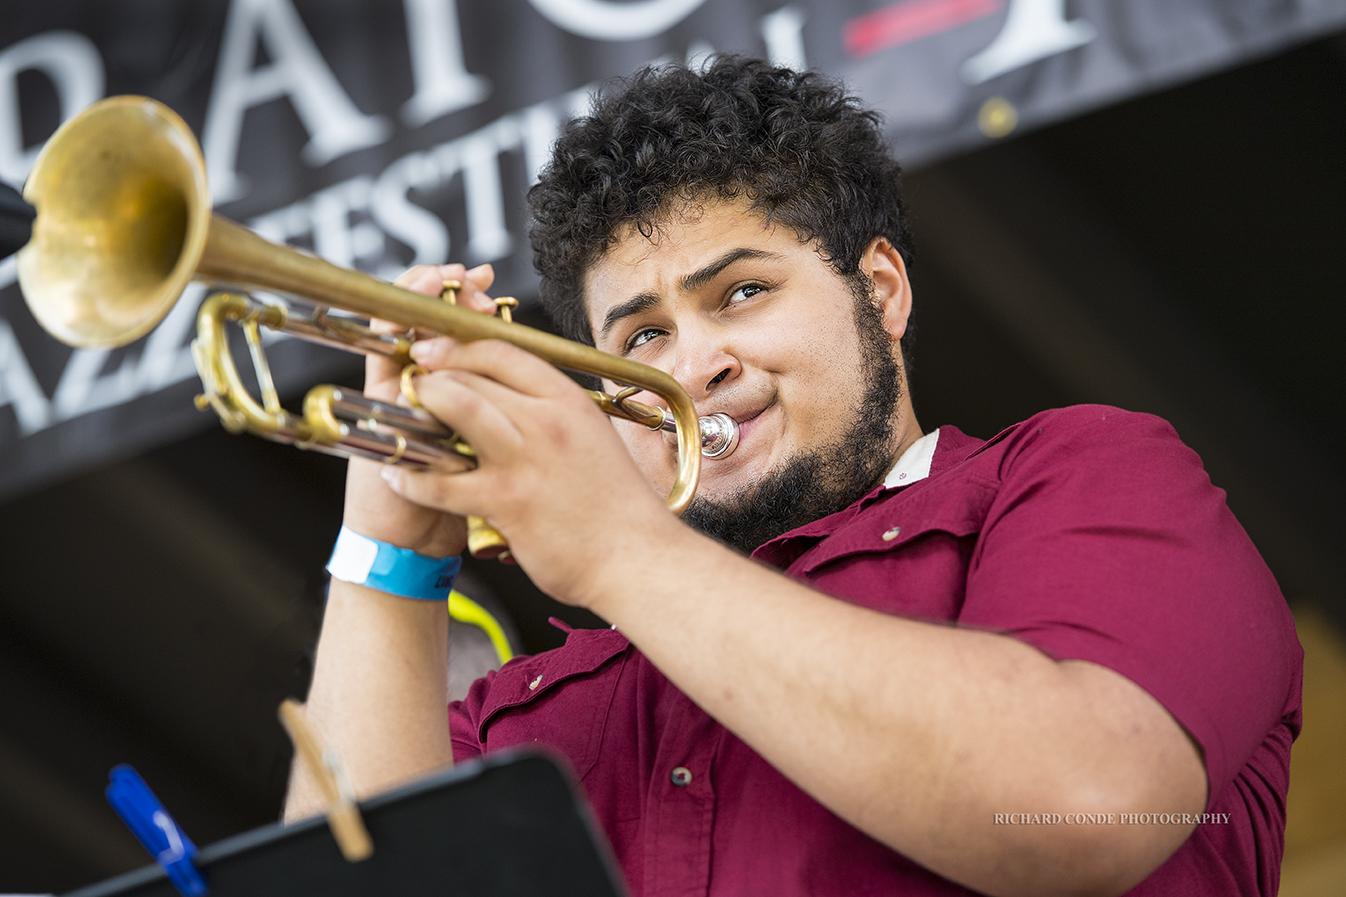 Adam O'Farrill at the Freihofer Saratoga Jazz Festival 2017